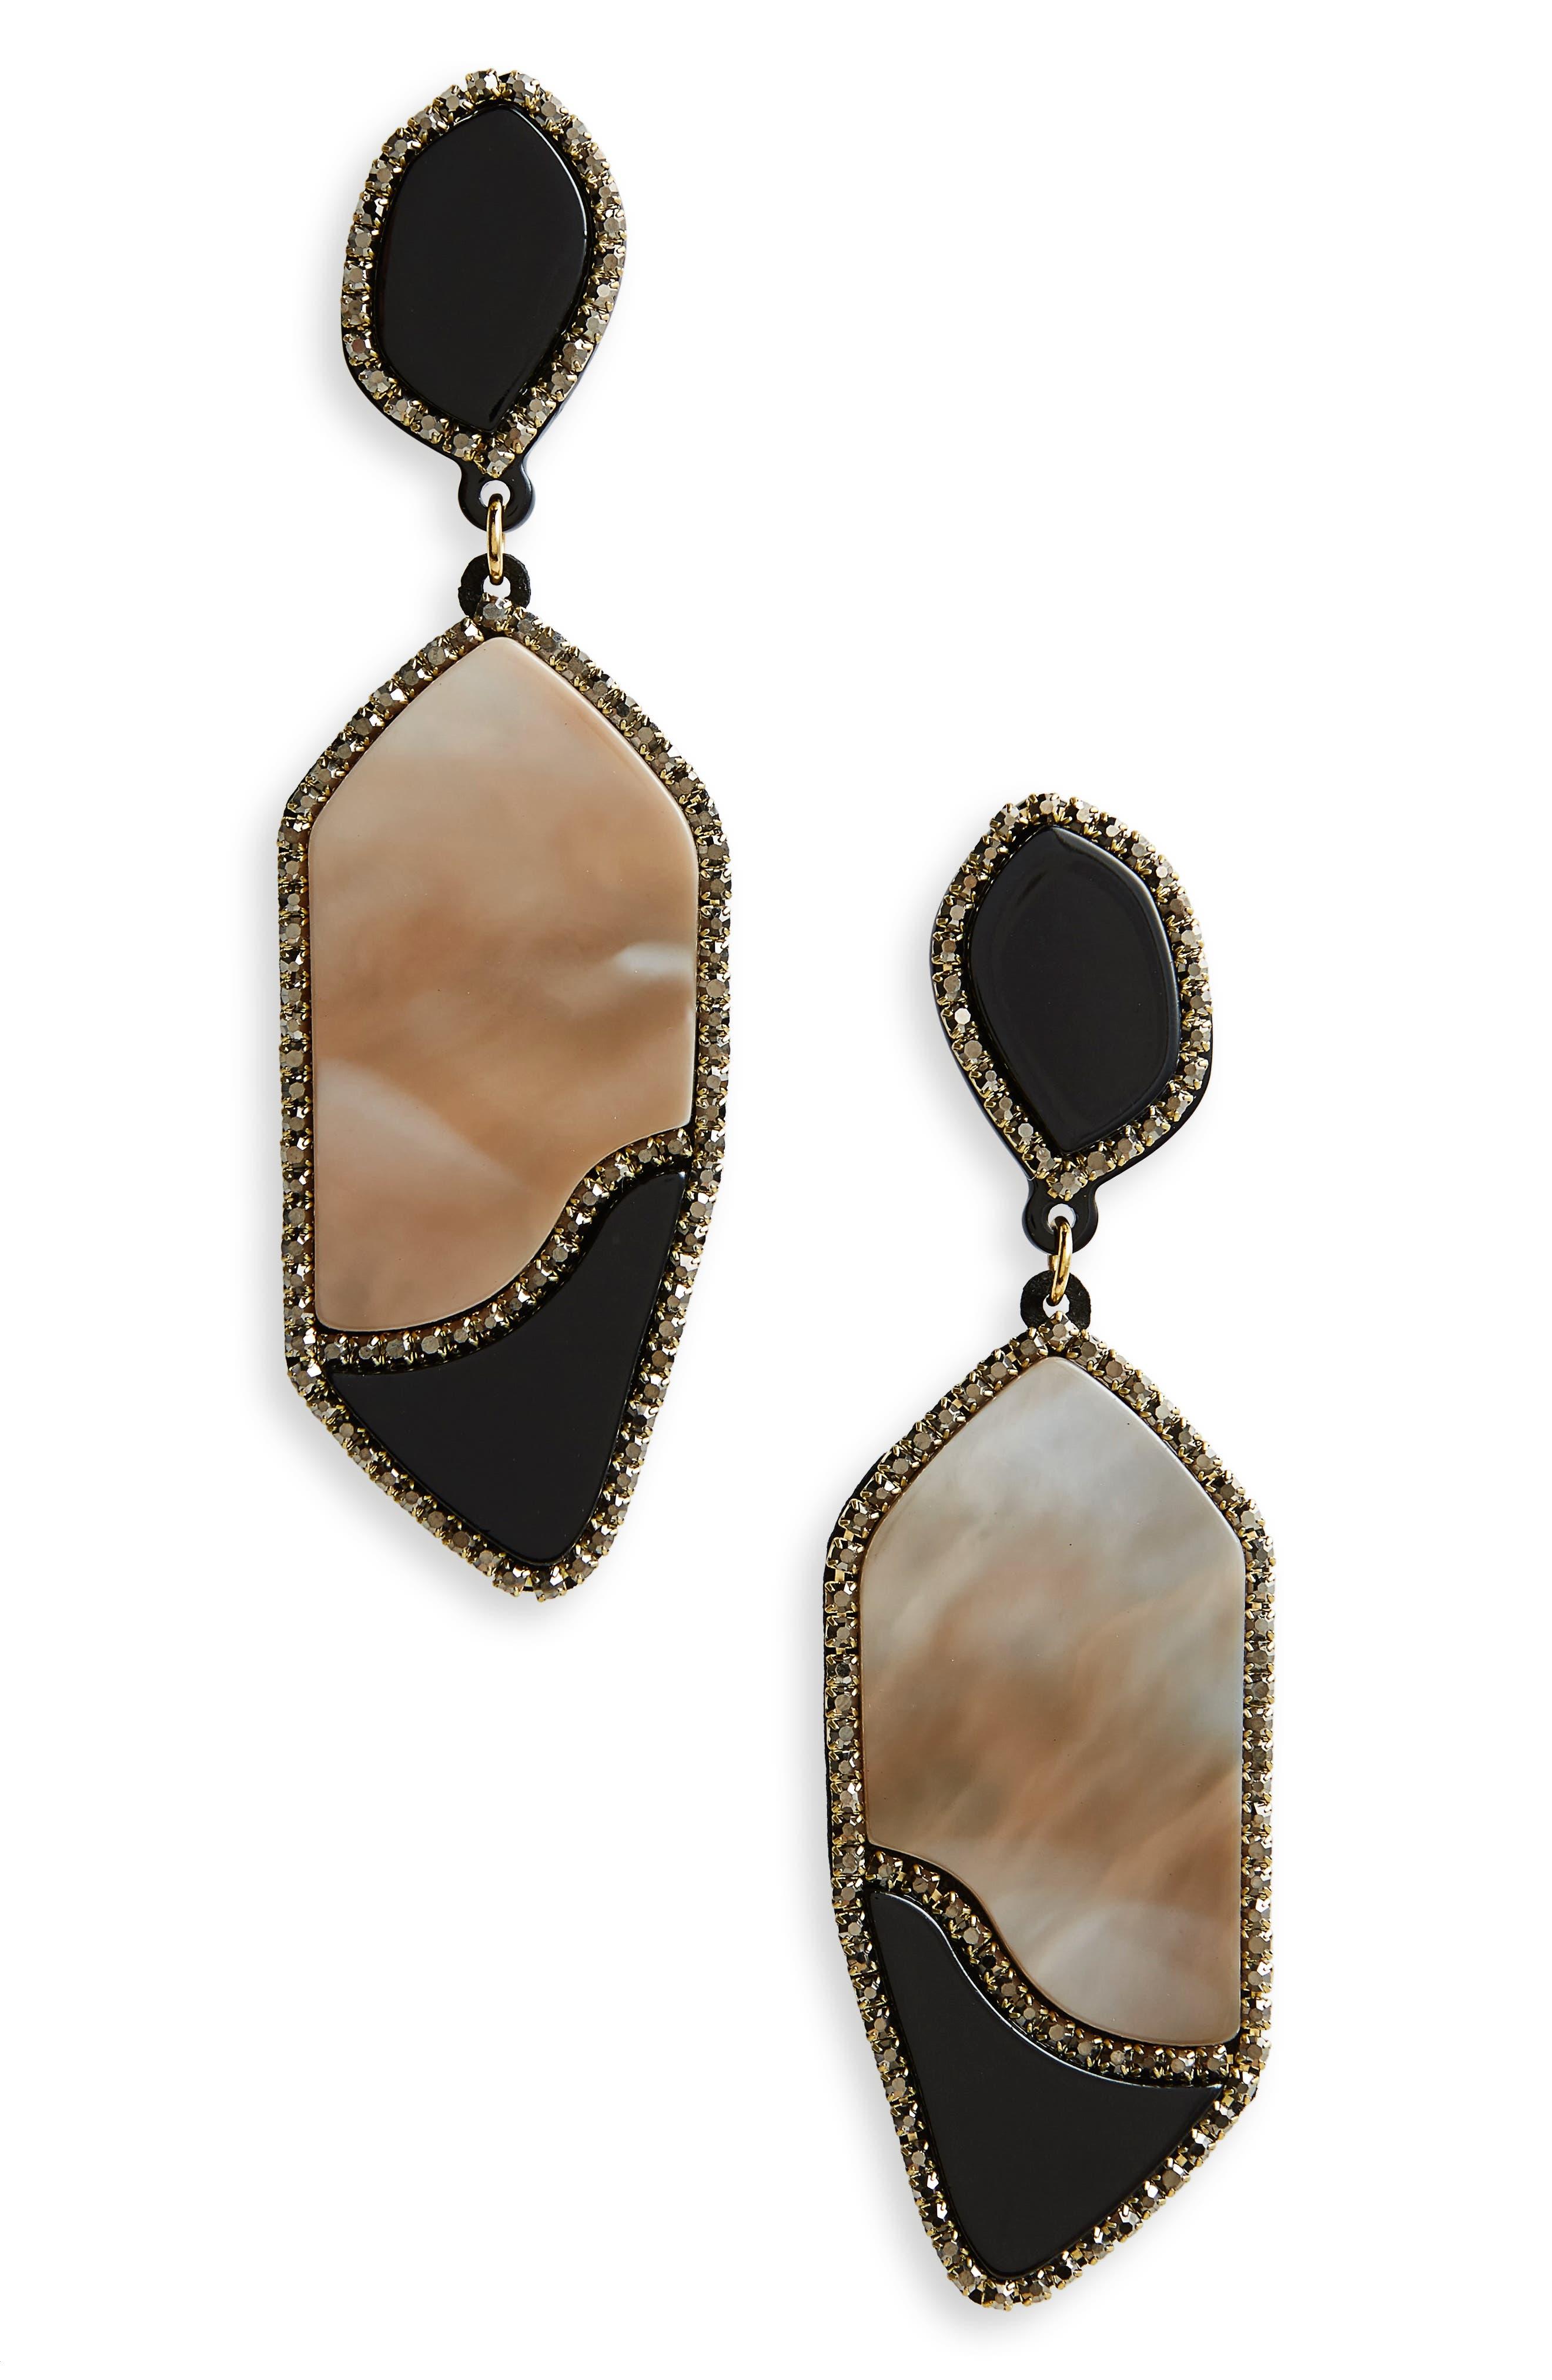 Resin Drop Earrings,                             Main thumbnail 1, color,                             Black/ White